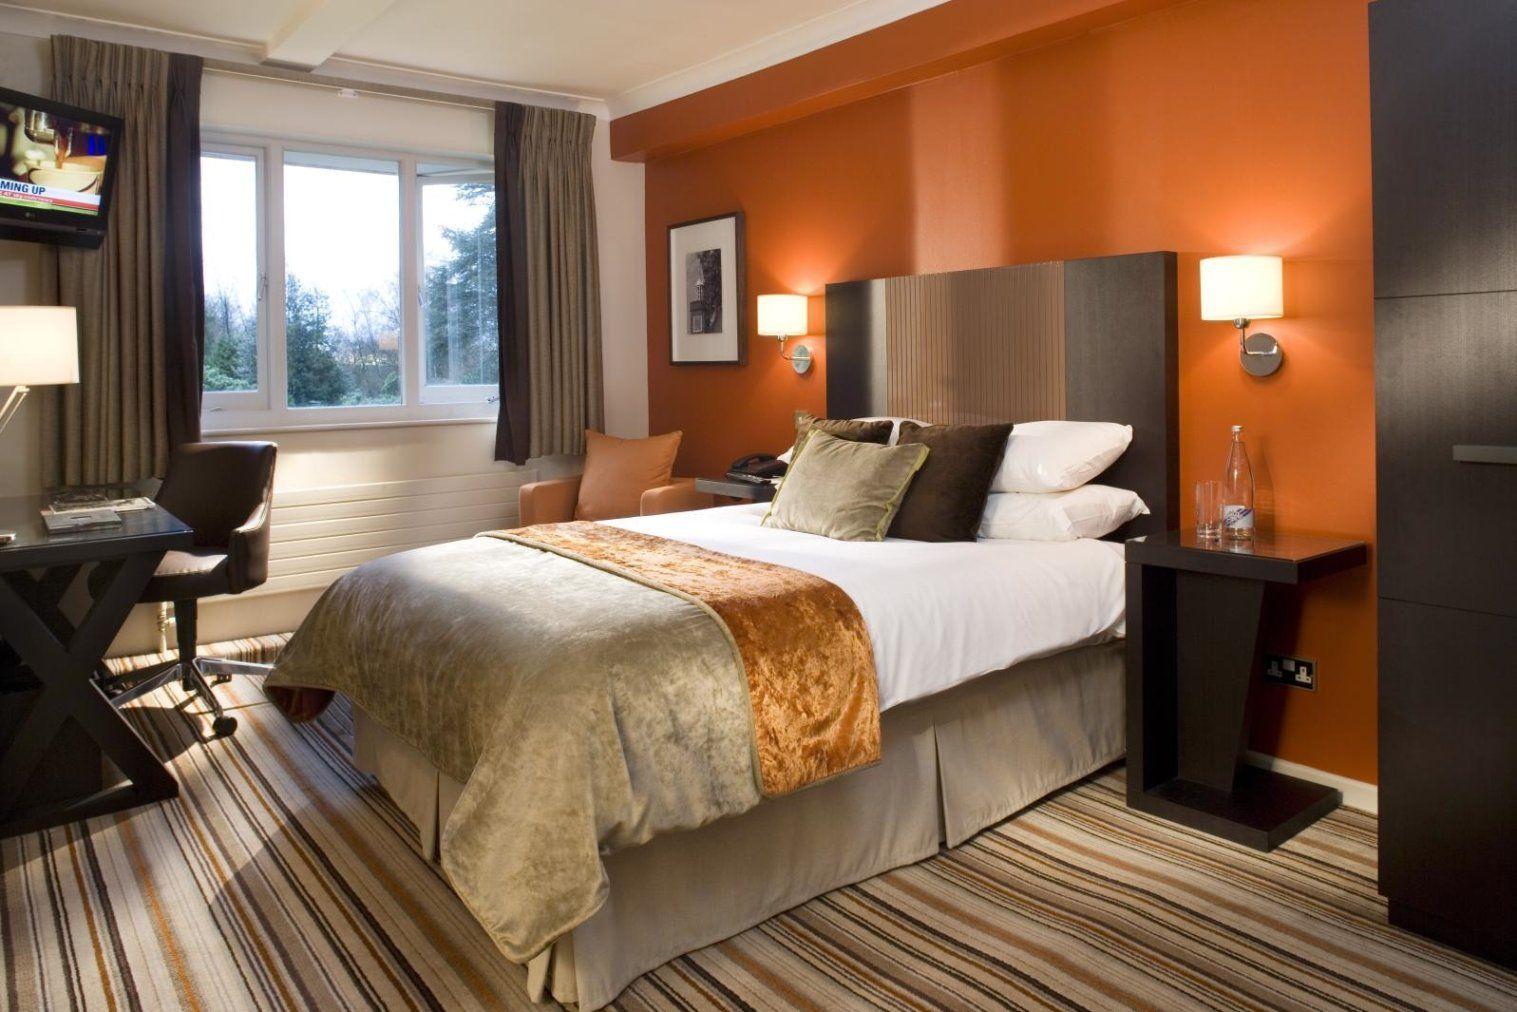 Fabulous Orange Bedroom Decorating Ideas And Designs For 2013 Warm Bedroom Colors Luxury Bedroom Furniture Bedroom Paint Design